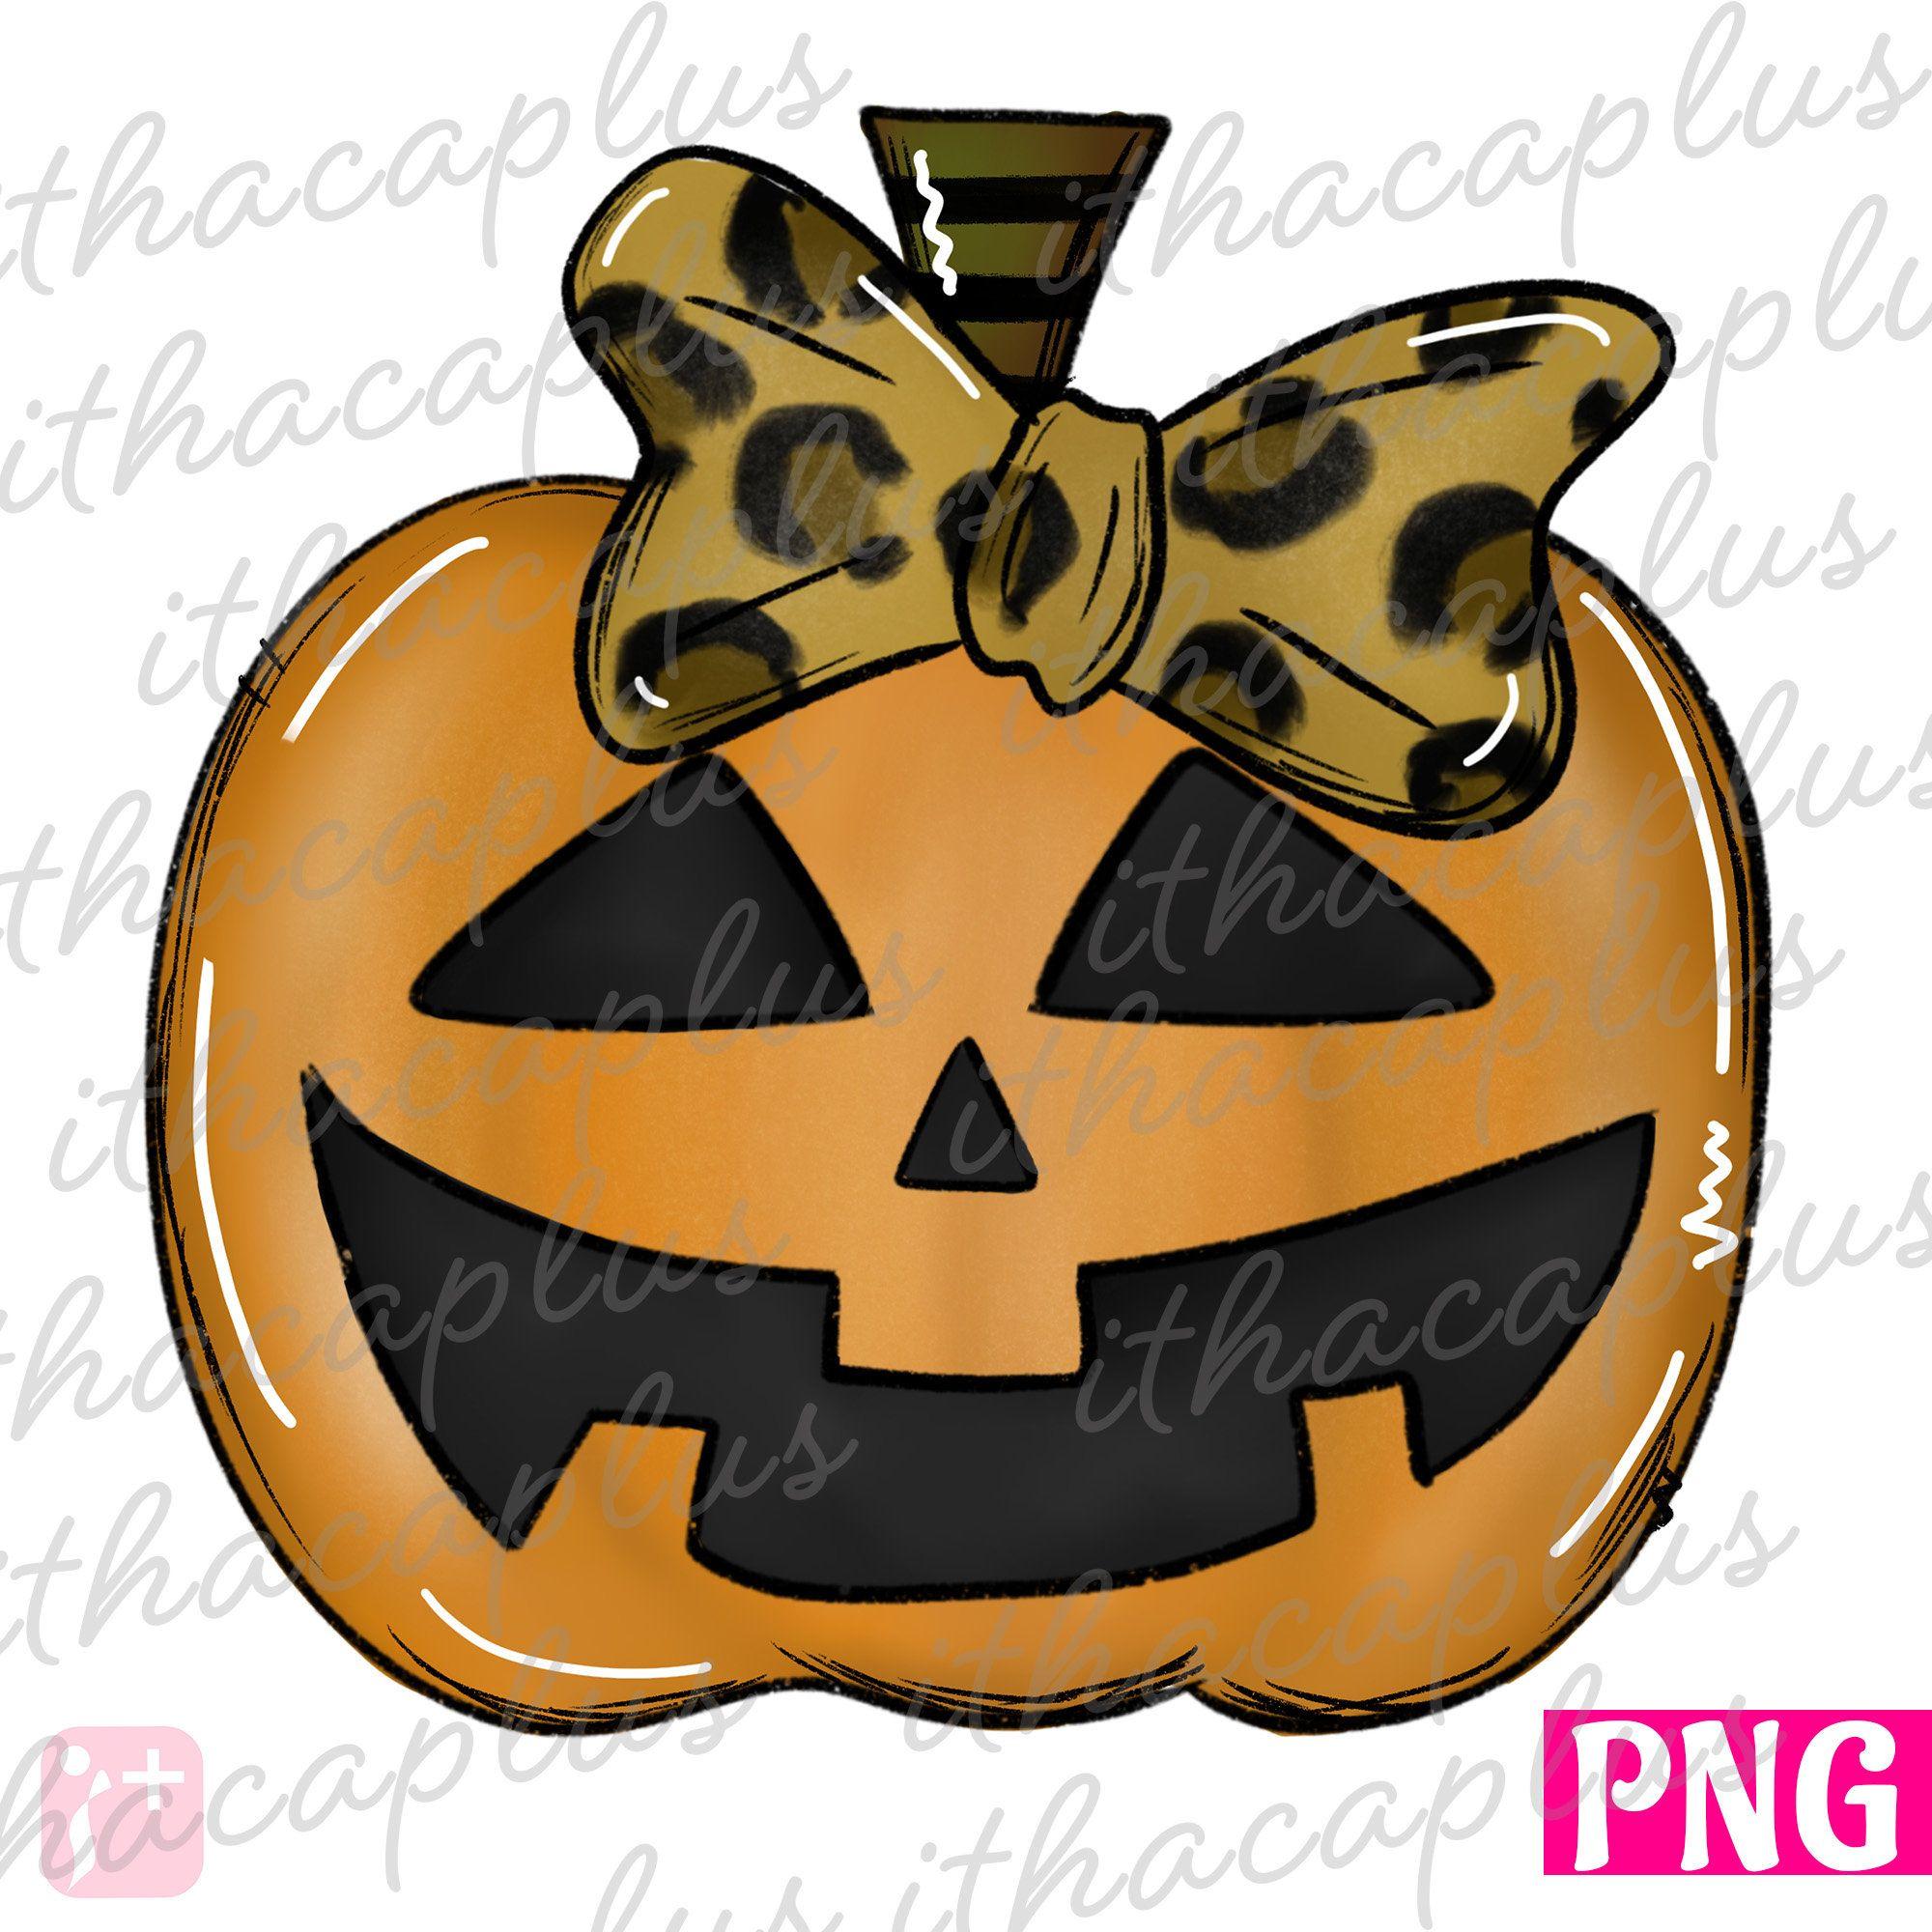 Fall Pnghalloween Png Halloween Leopard Pumpkin Sublimation Etsy In 2021 Whimsical Halloween Halloween Digital Pumpkin Drawing